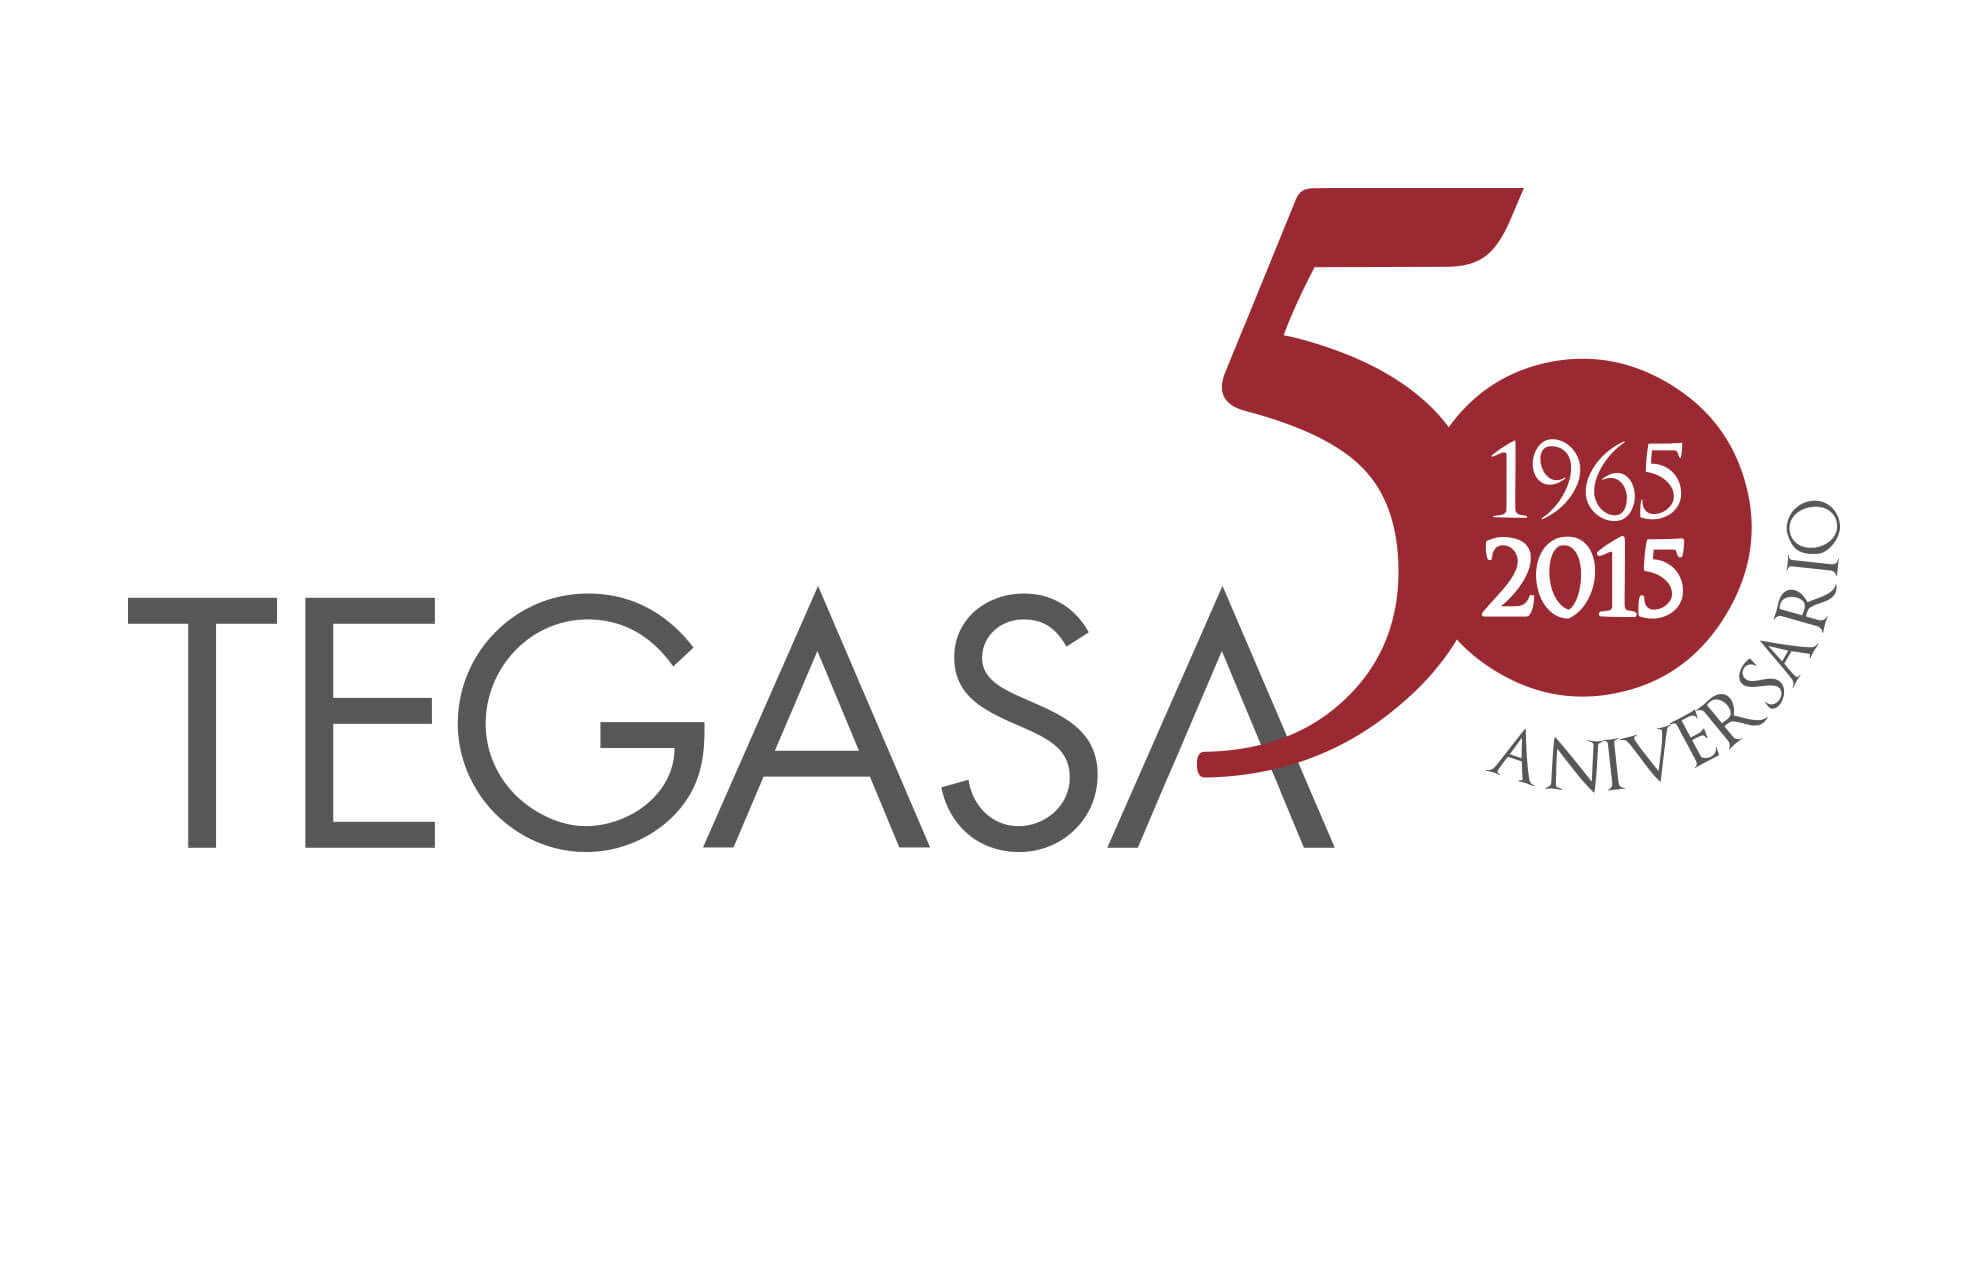 Tegas logotipo conmemorativo 501 - Branding. Conmemorativo. Sector servicios